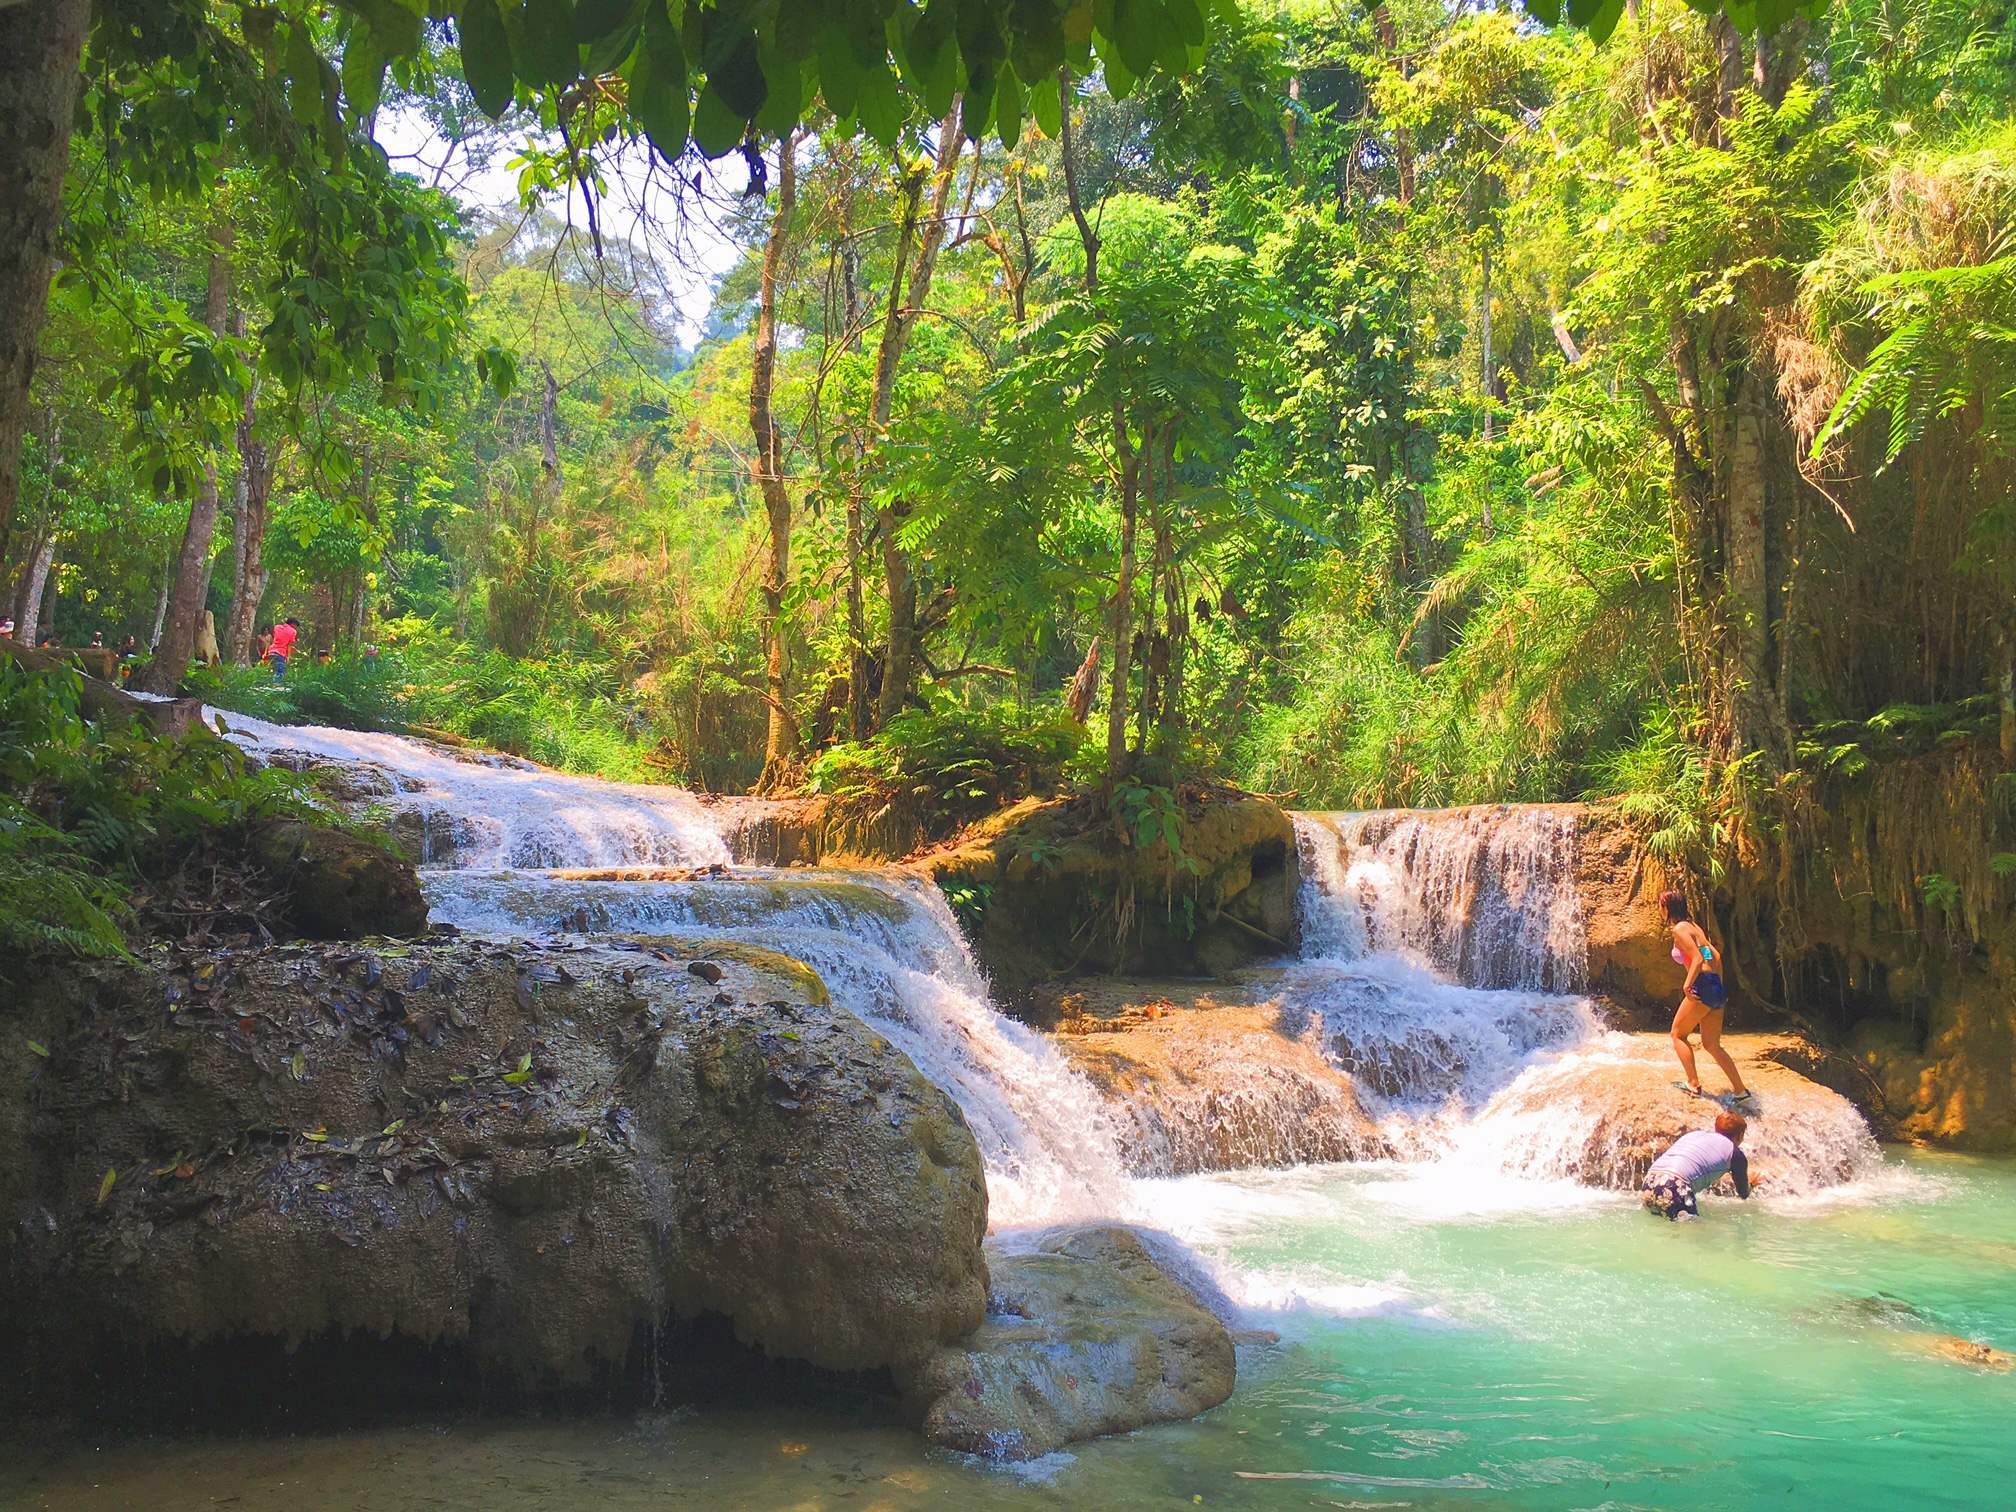 Kuang-Si Waterfalls in Laos, Luang Prabang - illumelation.com